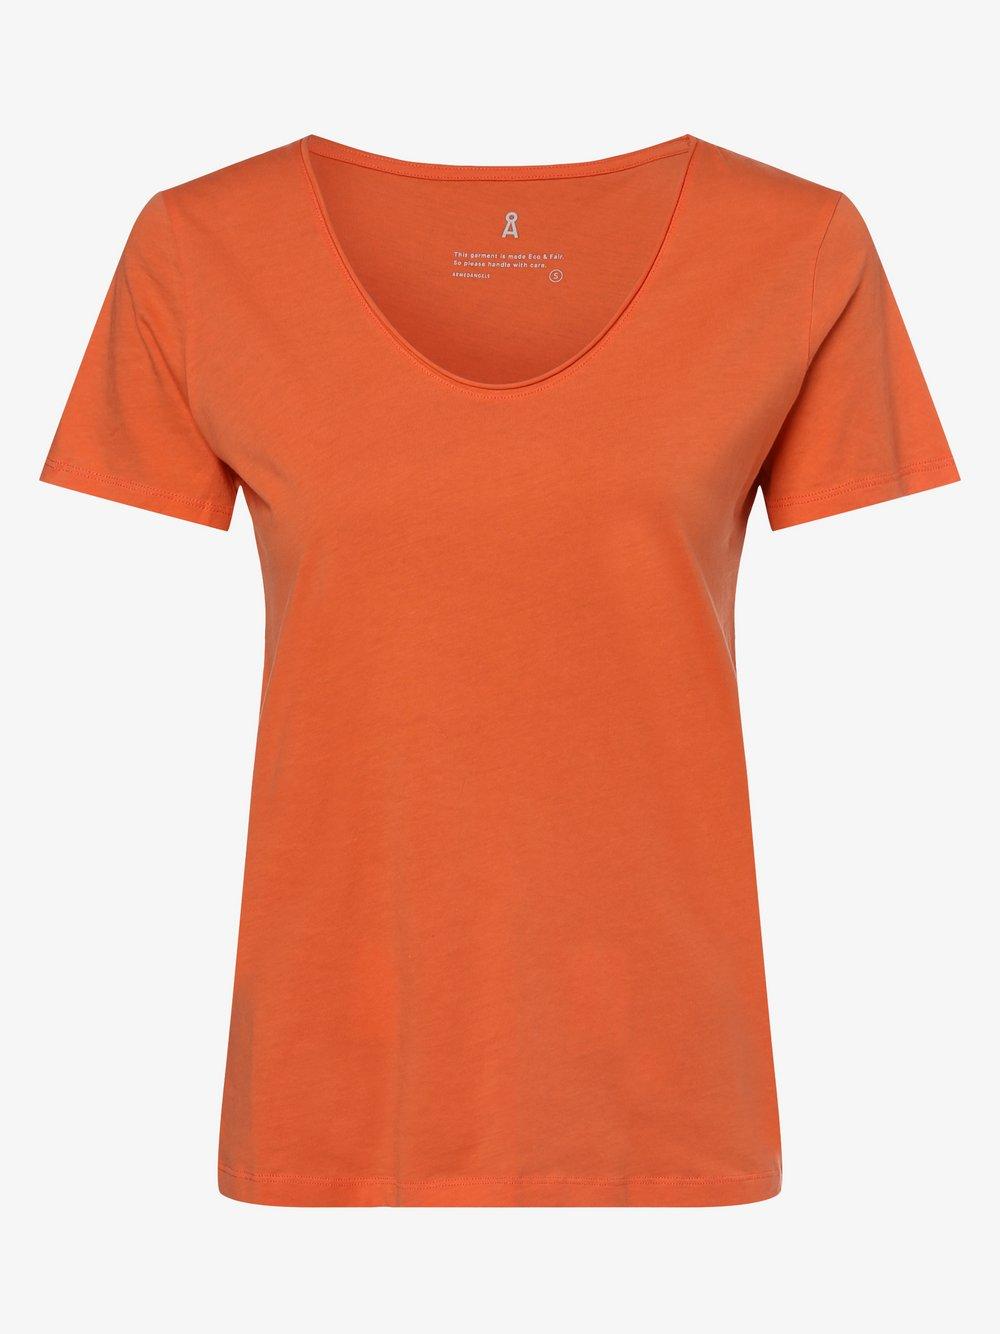 ARMEDANGELS - T-shirt damski – Haadia, pomarańczowy